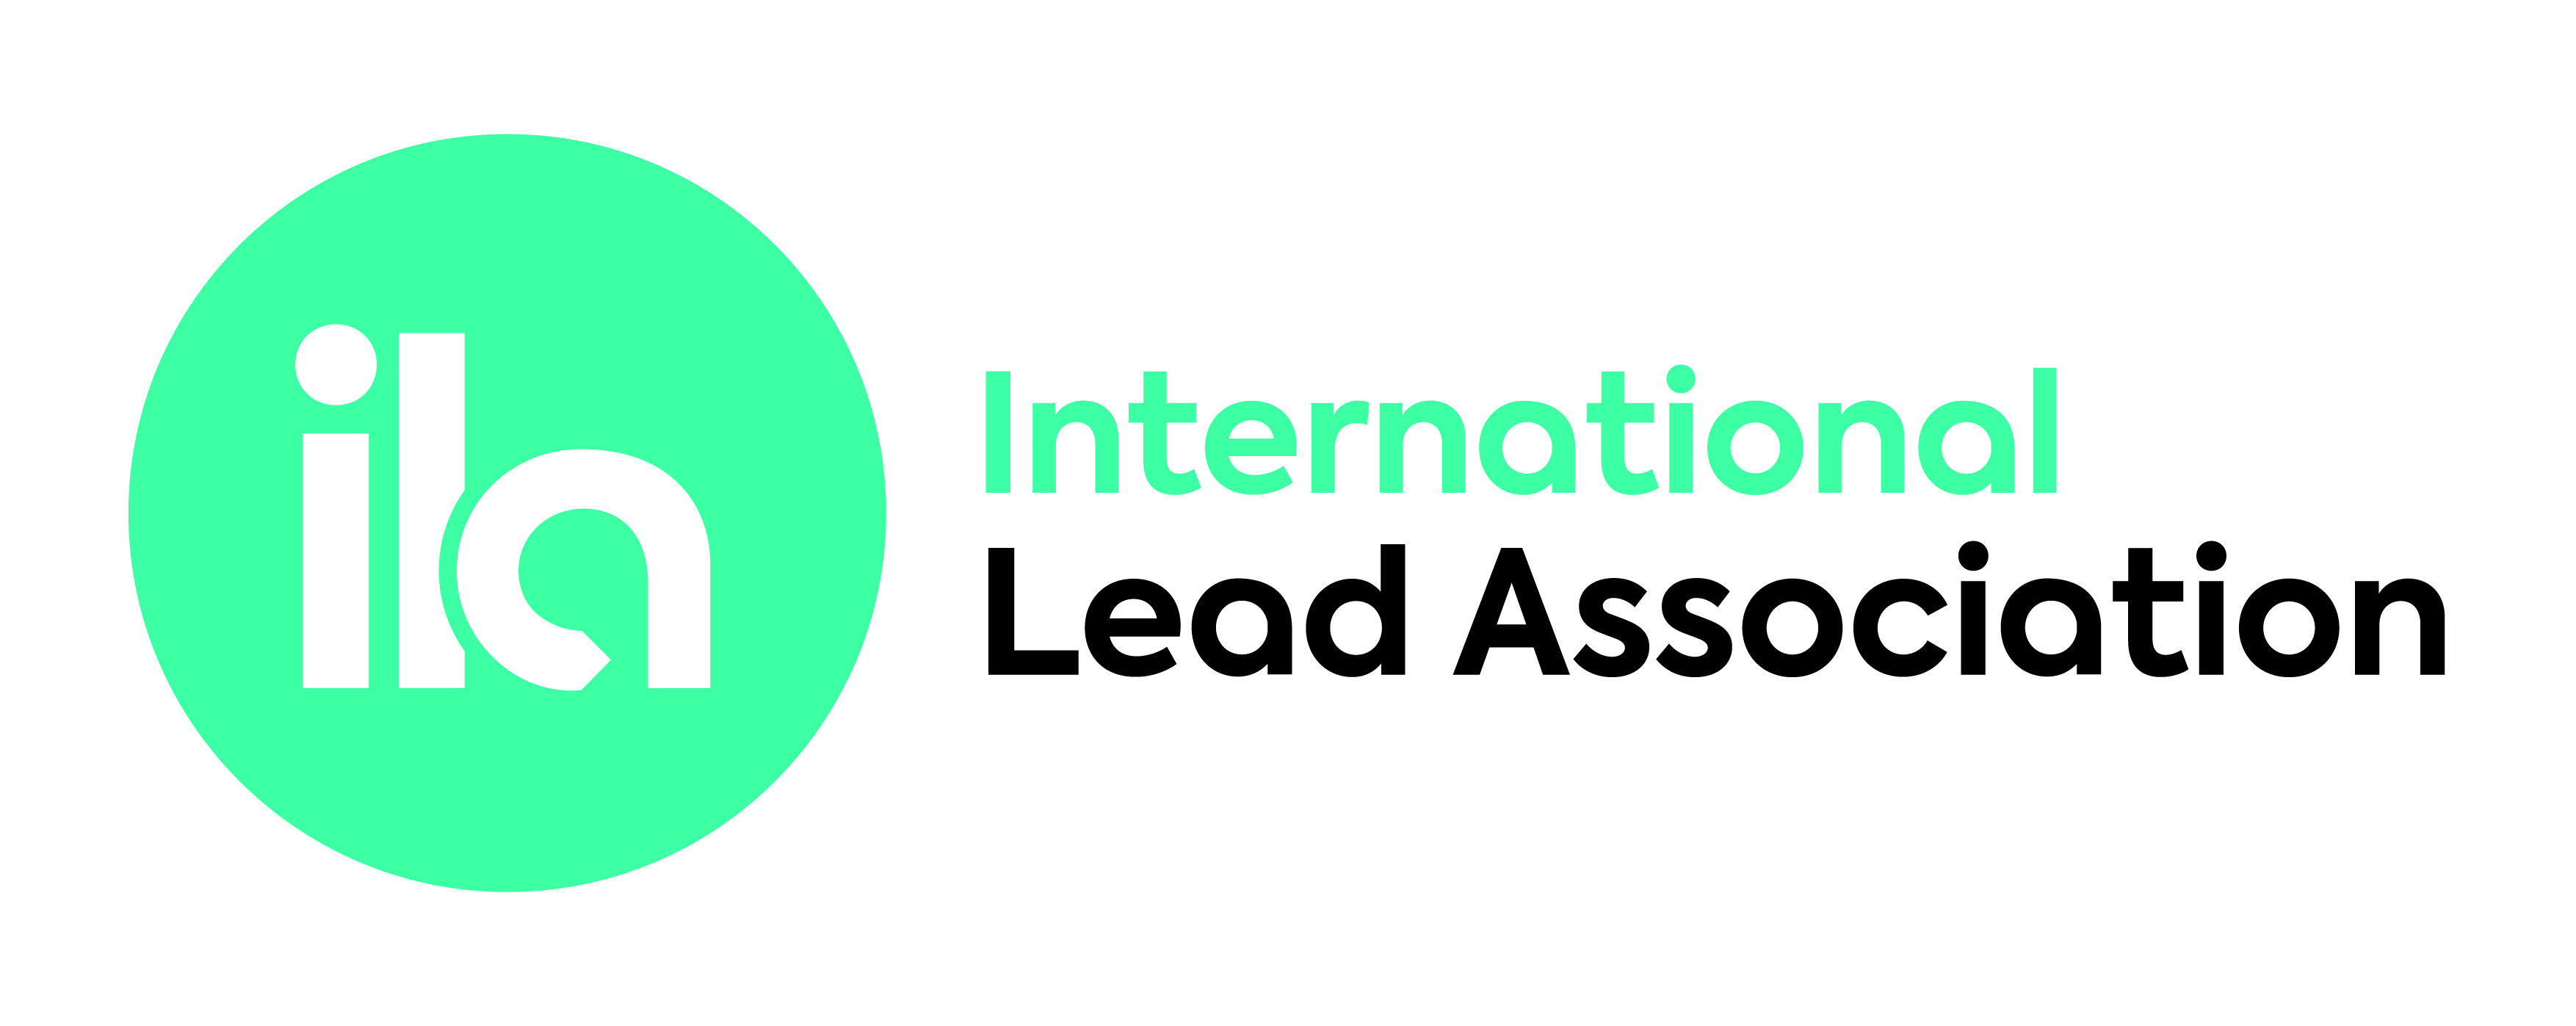 International Lead Association (ILA)